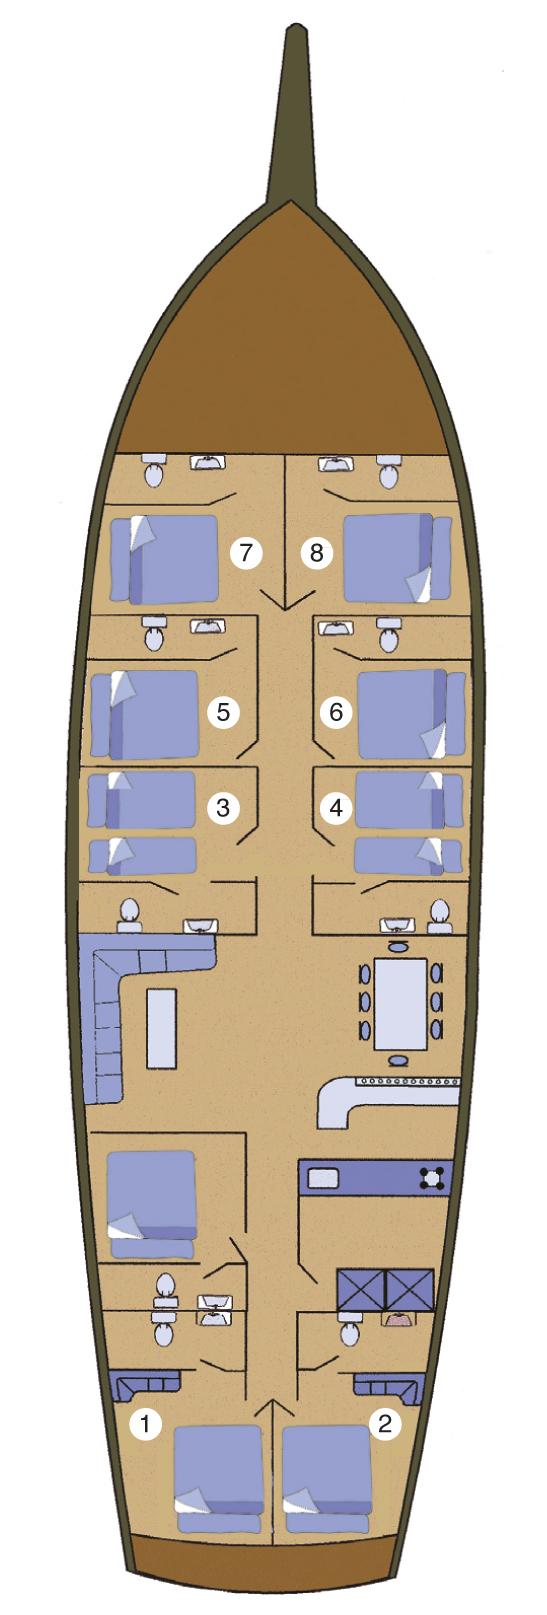 Babaveli-7-layout.jpg